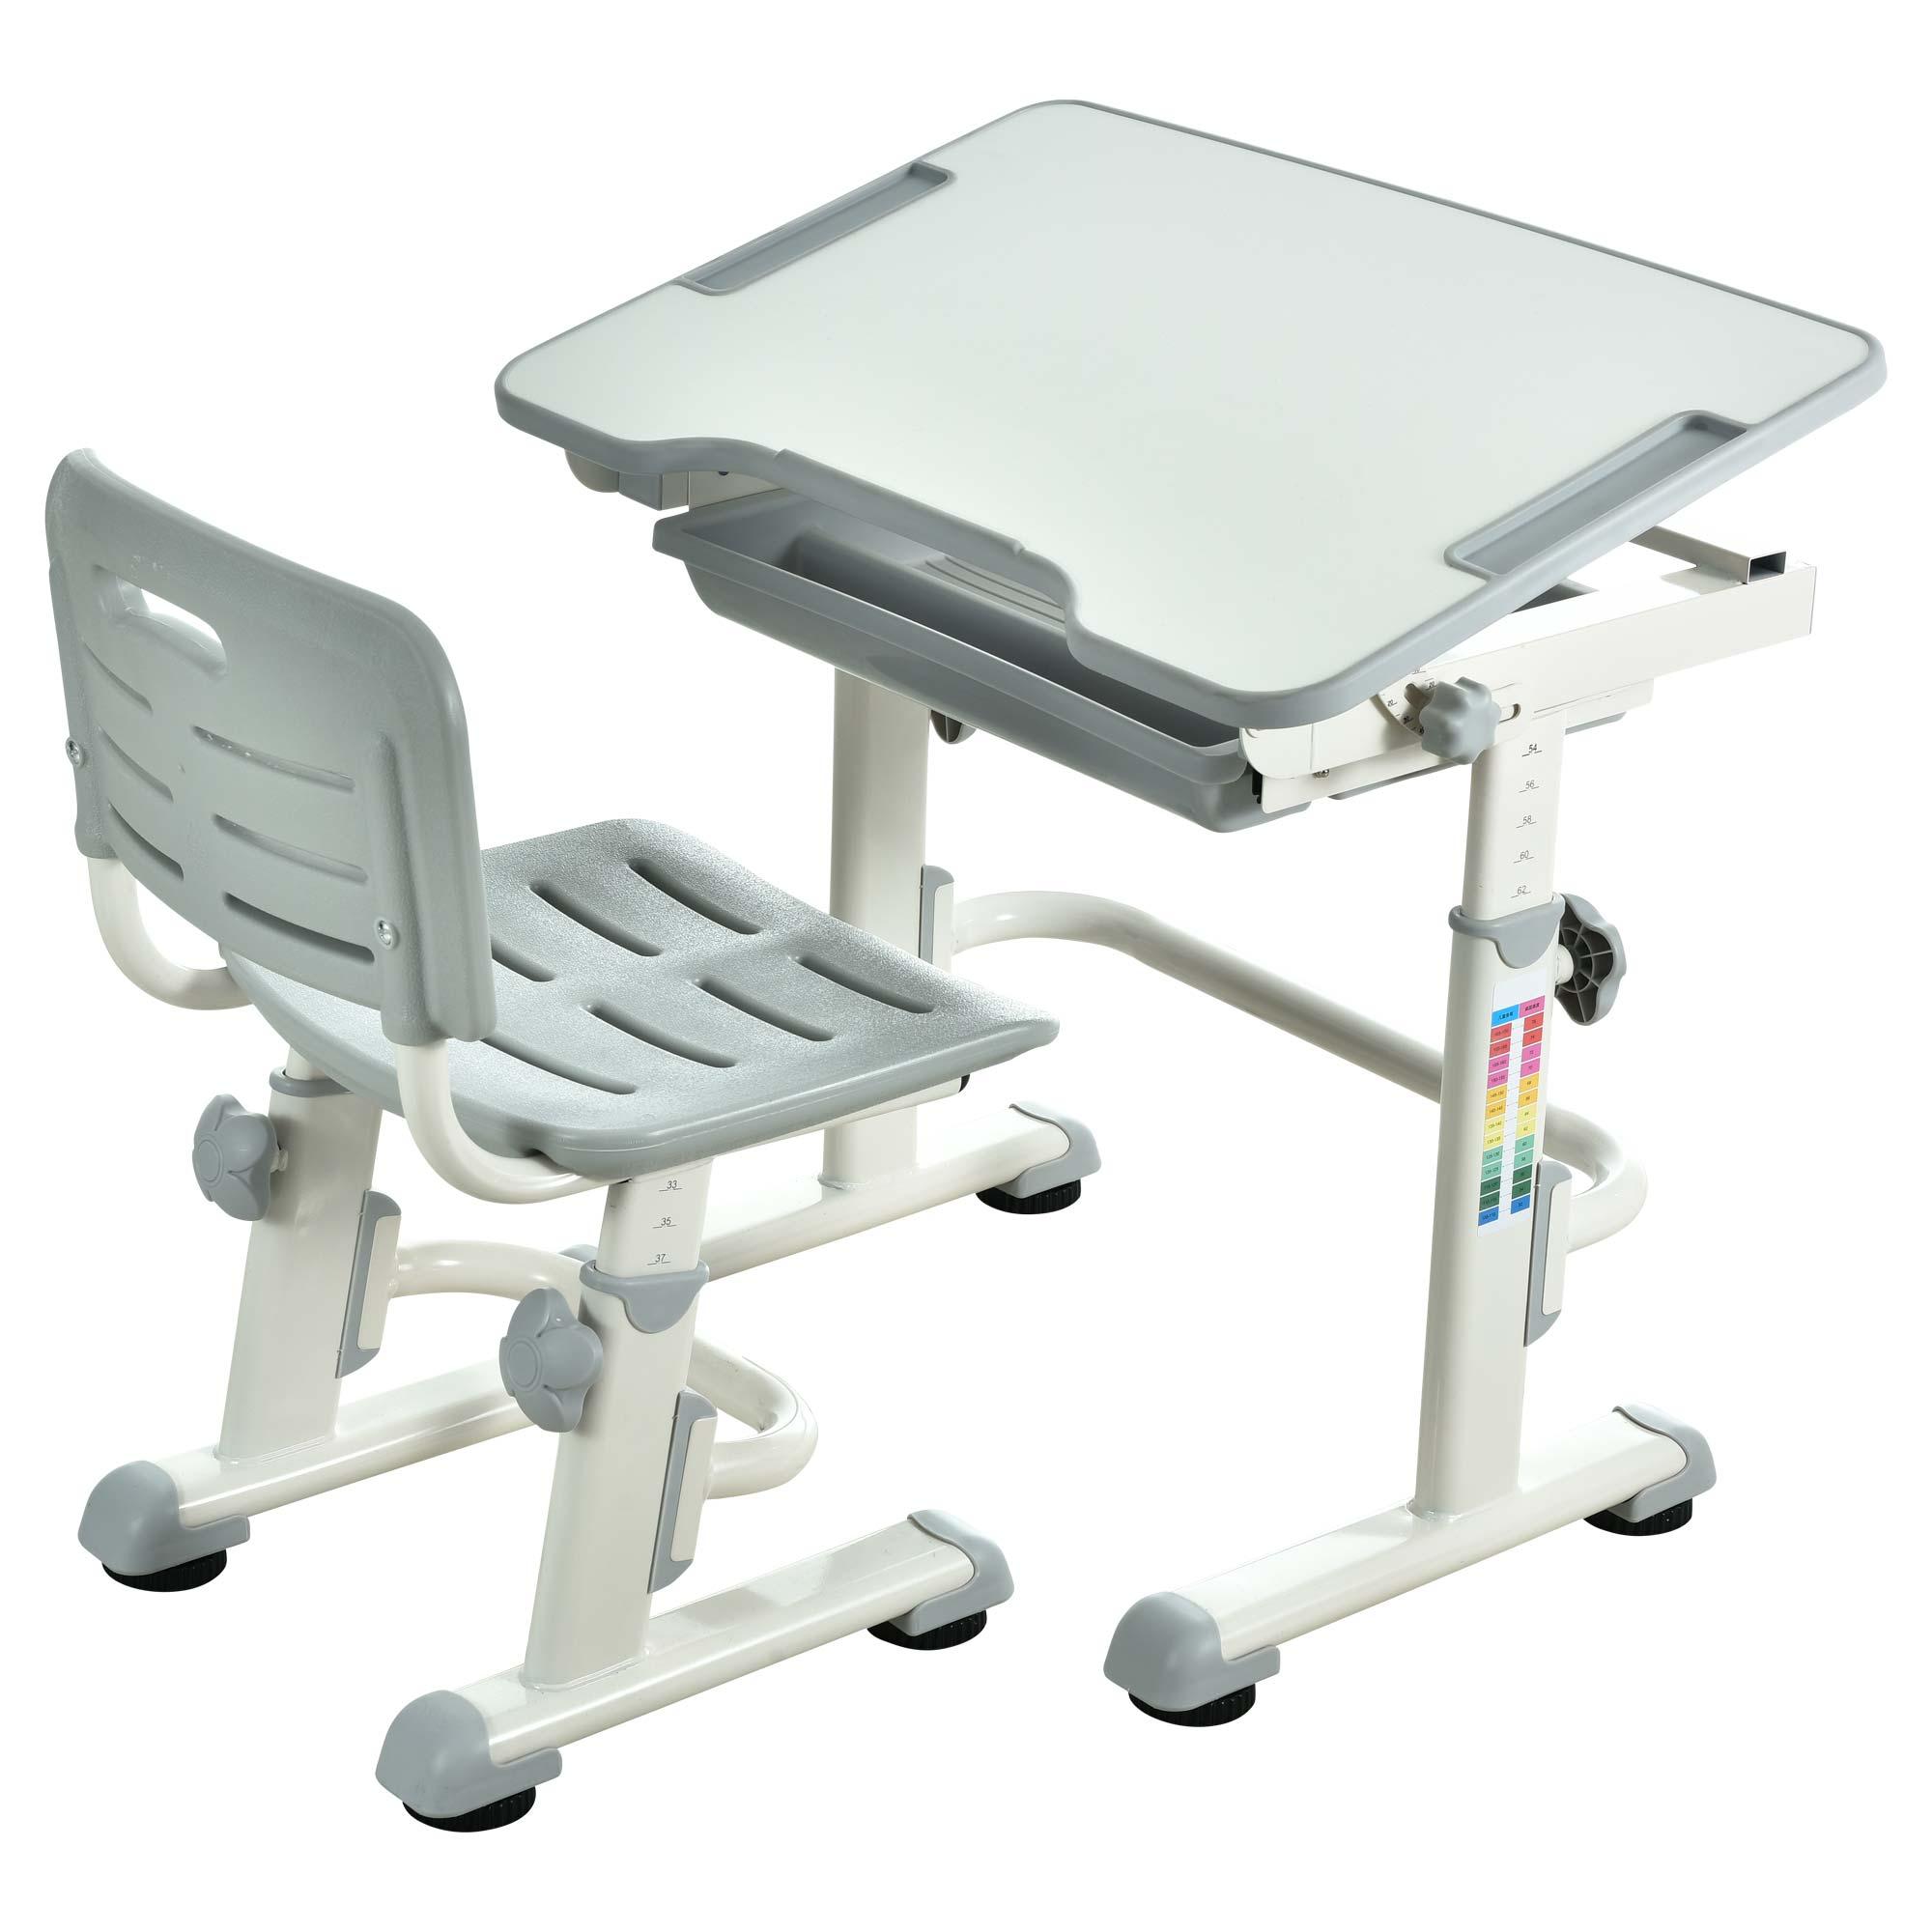 ergonomic-kids-desk-height-adjustable-table-for-kids-school-desk-grey-desk-13